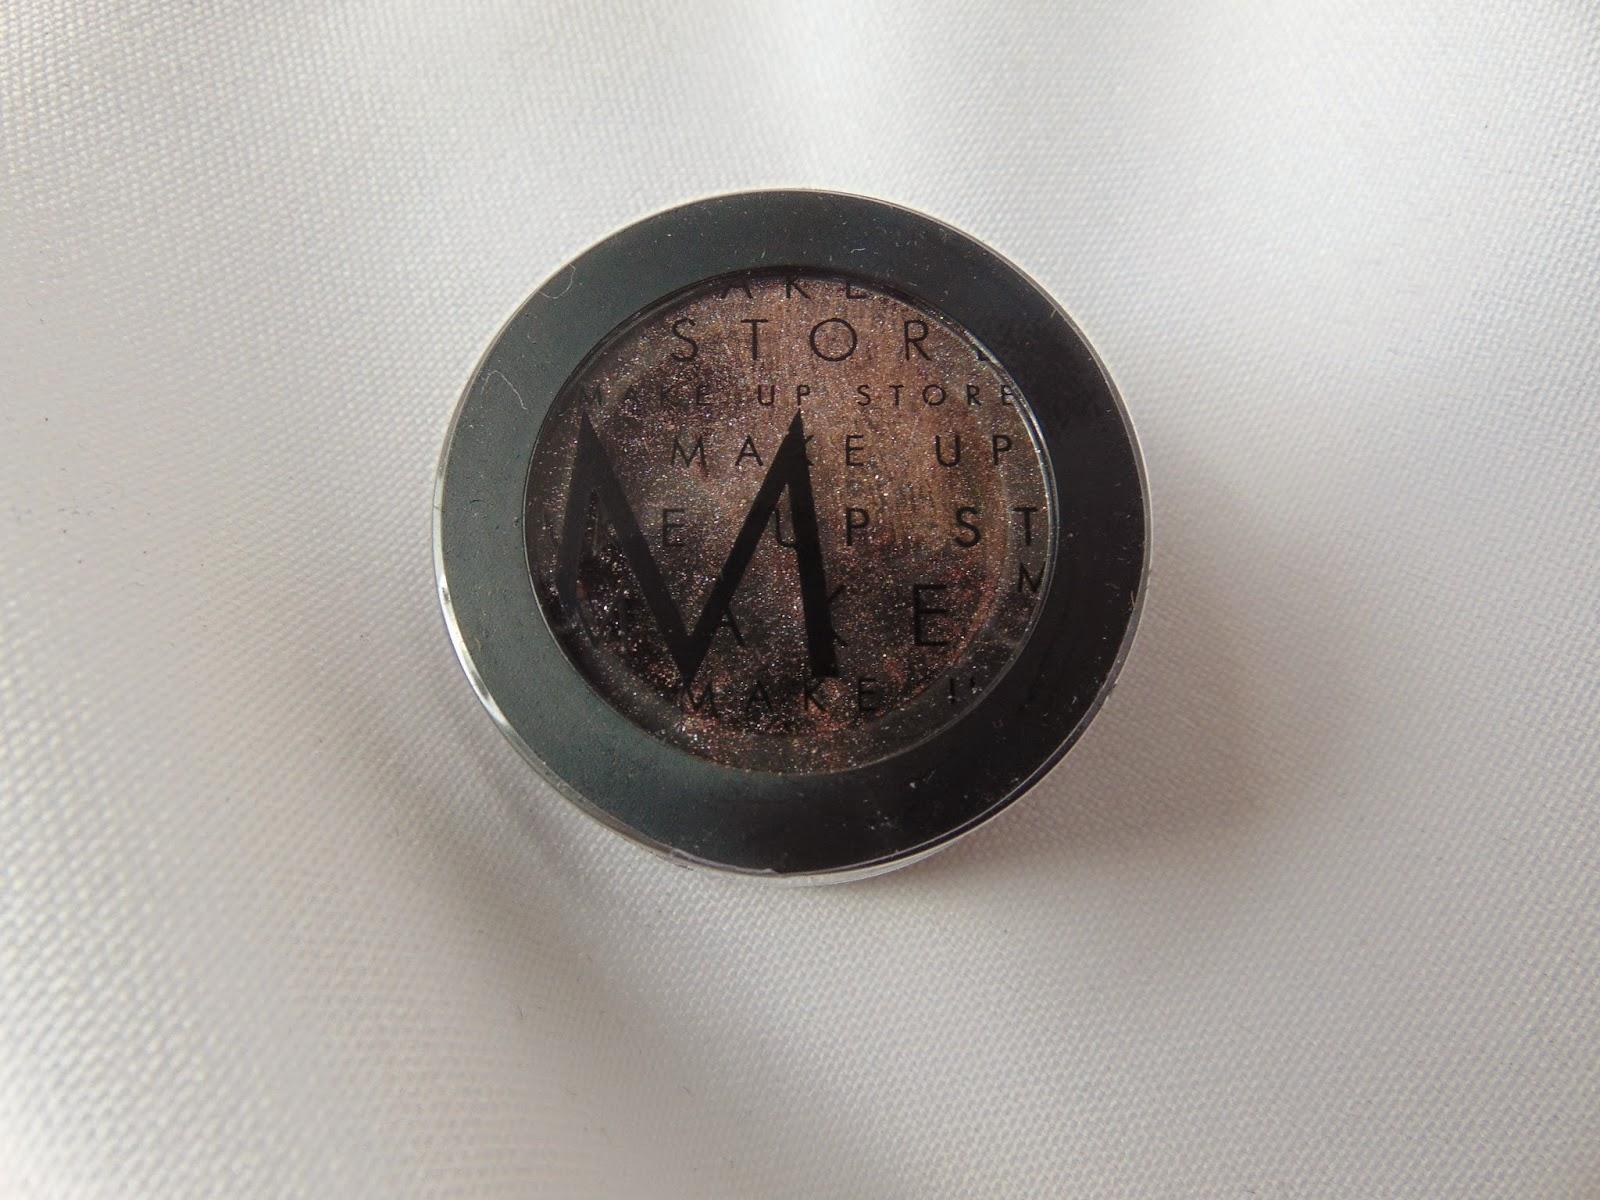 Makeup Store - Eyedust - www.annitschkasblog.de